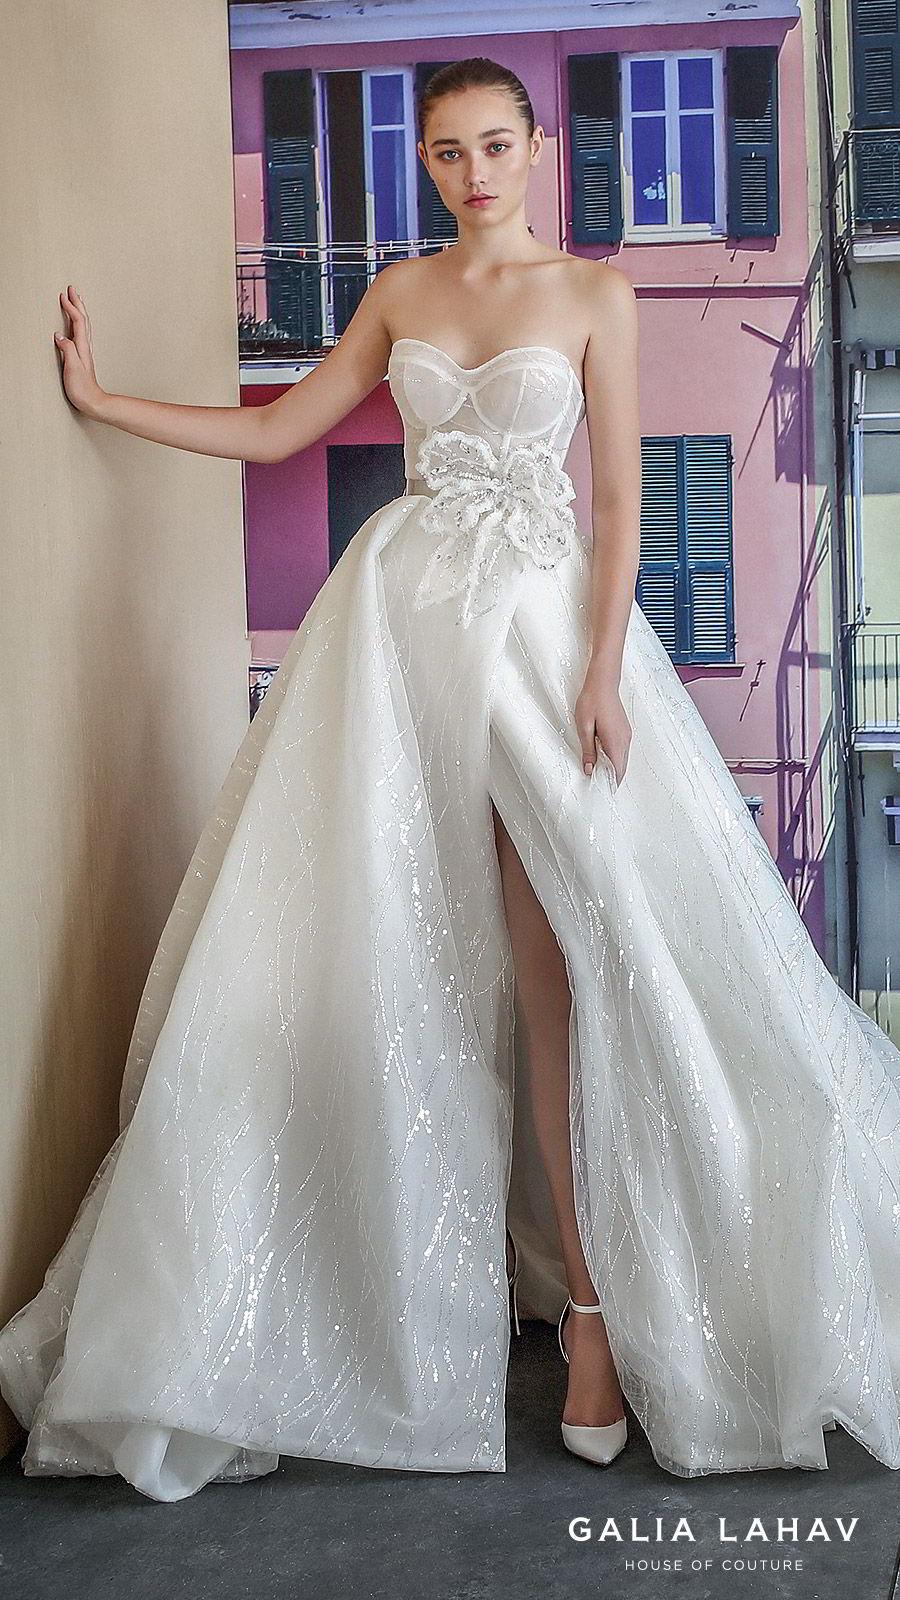 galia lahav fall 2019 bridal strapless sweetheart glitzy ball gown wedding dress slit skirt romantic sweep train (magdalena) mv